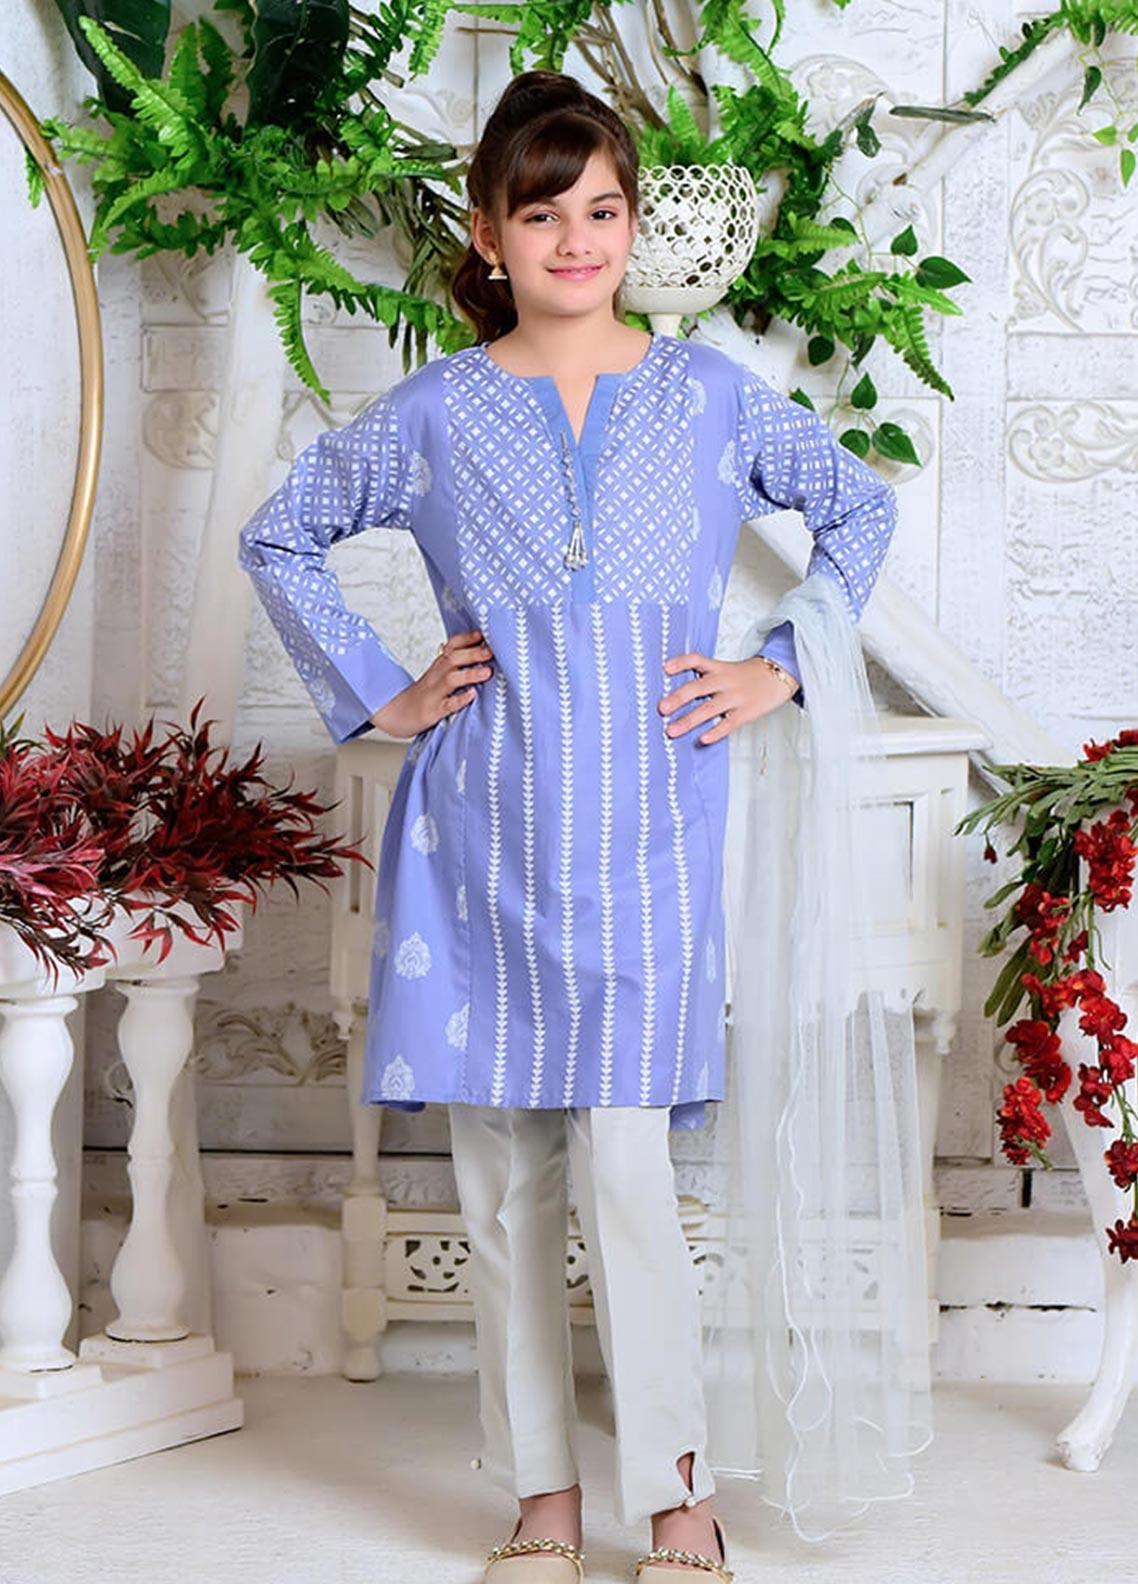 Ochre Cotton Formal 3 Piece Suit for Girls -  OFK 702 Light Blue